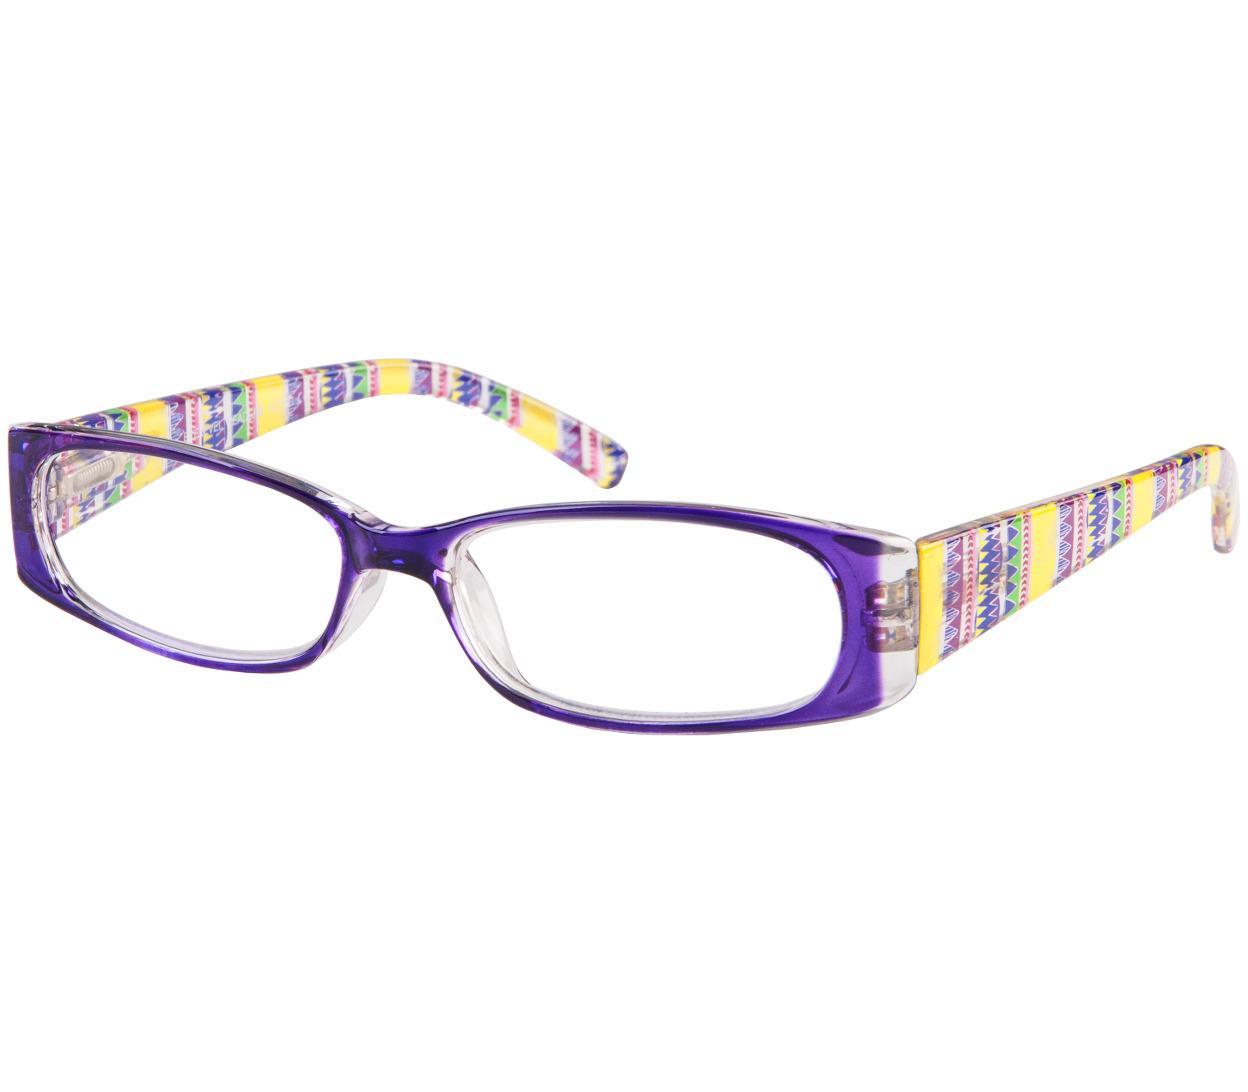 Main Image (Angle) - Aztec (Purple) Fashion Reading Glasses